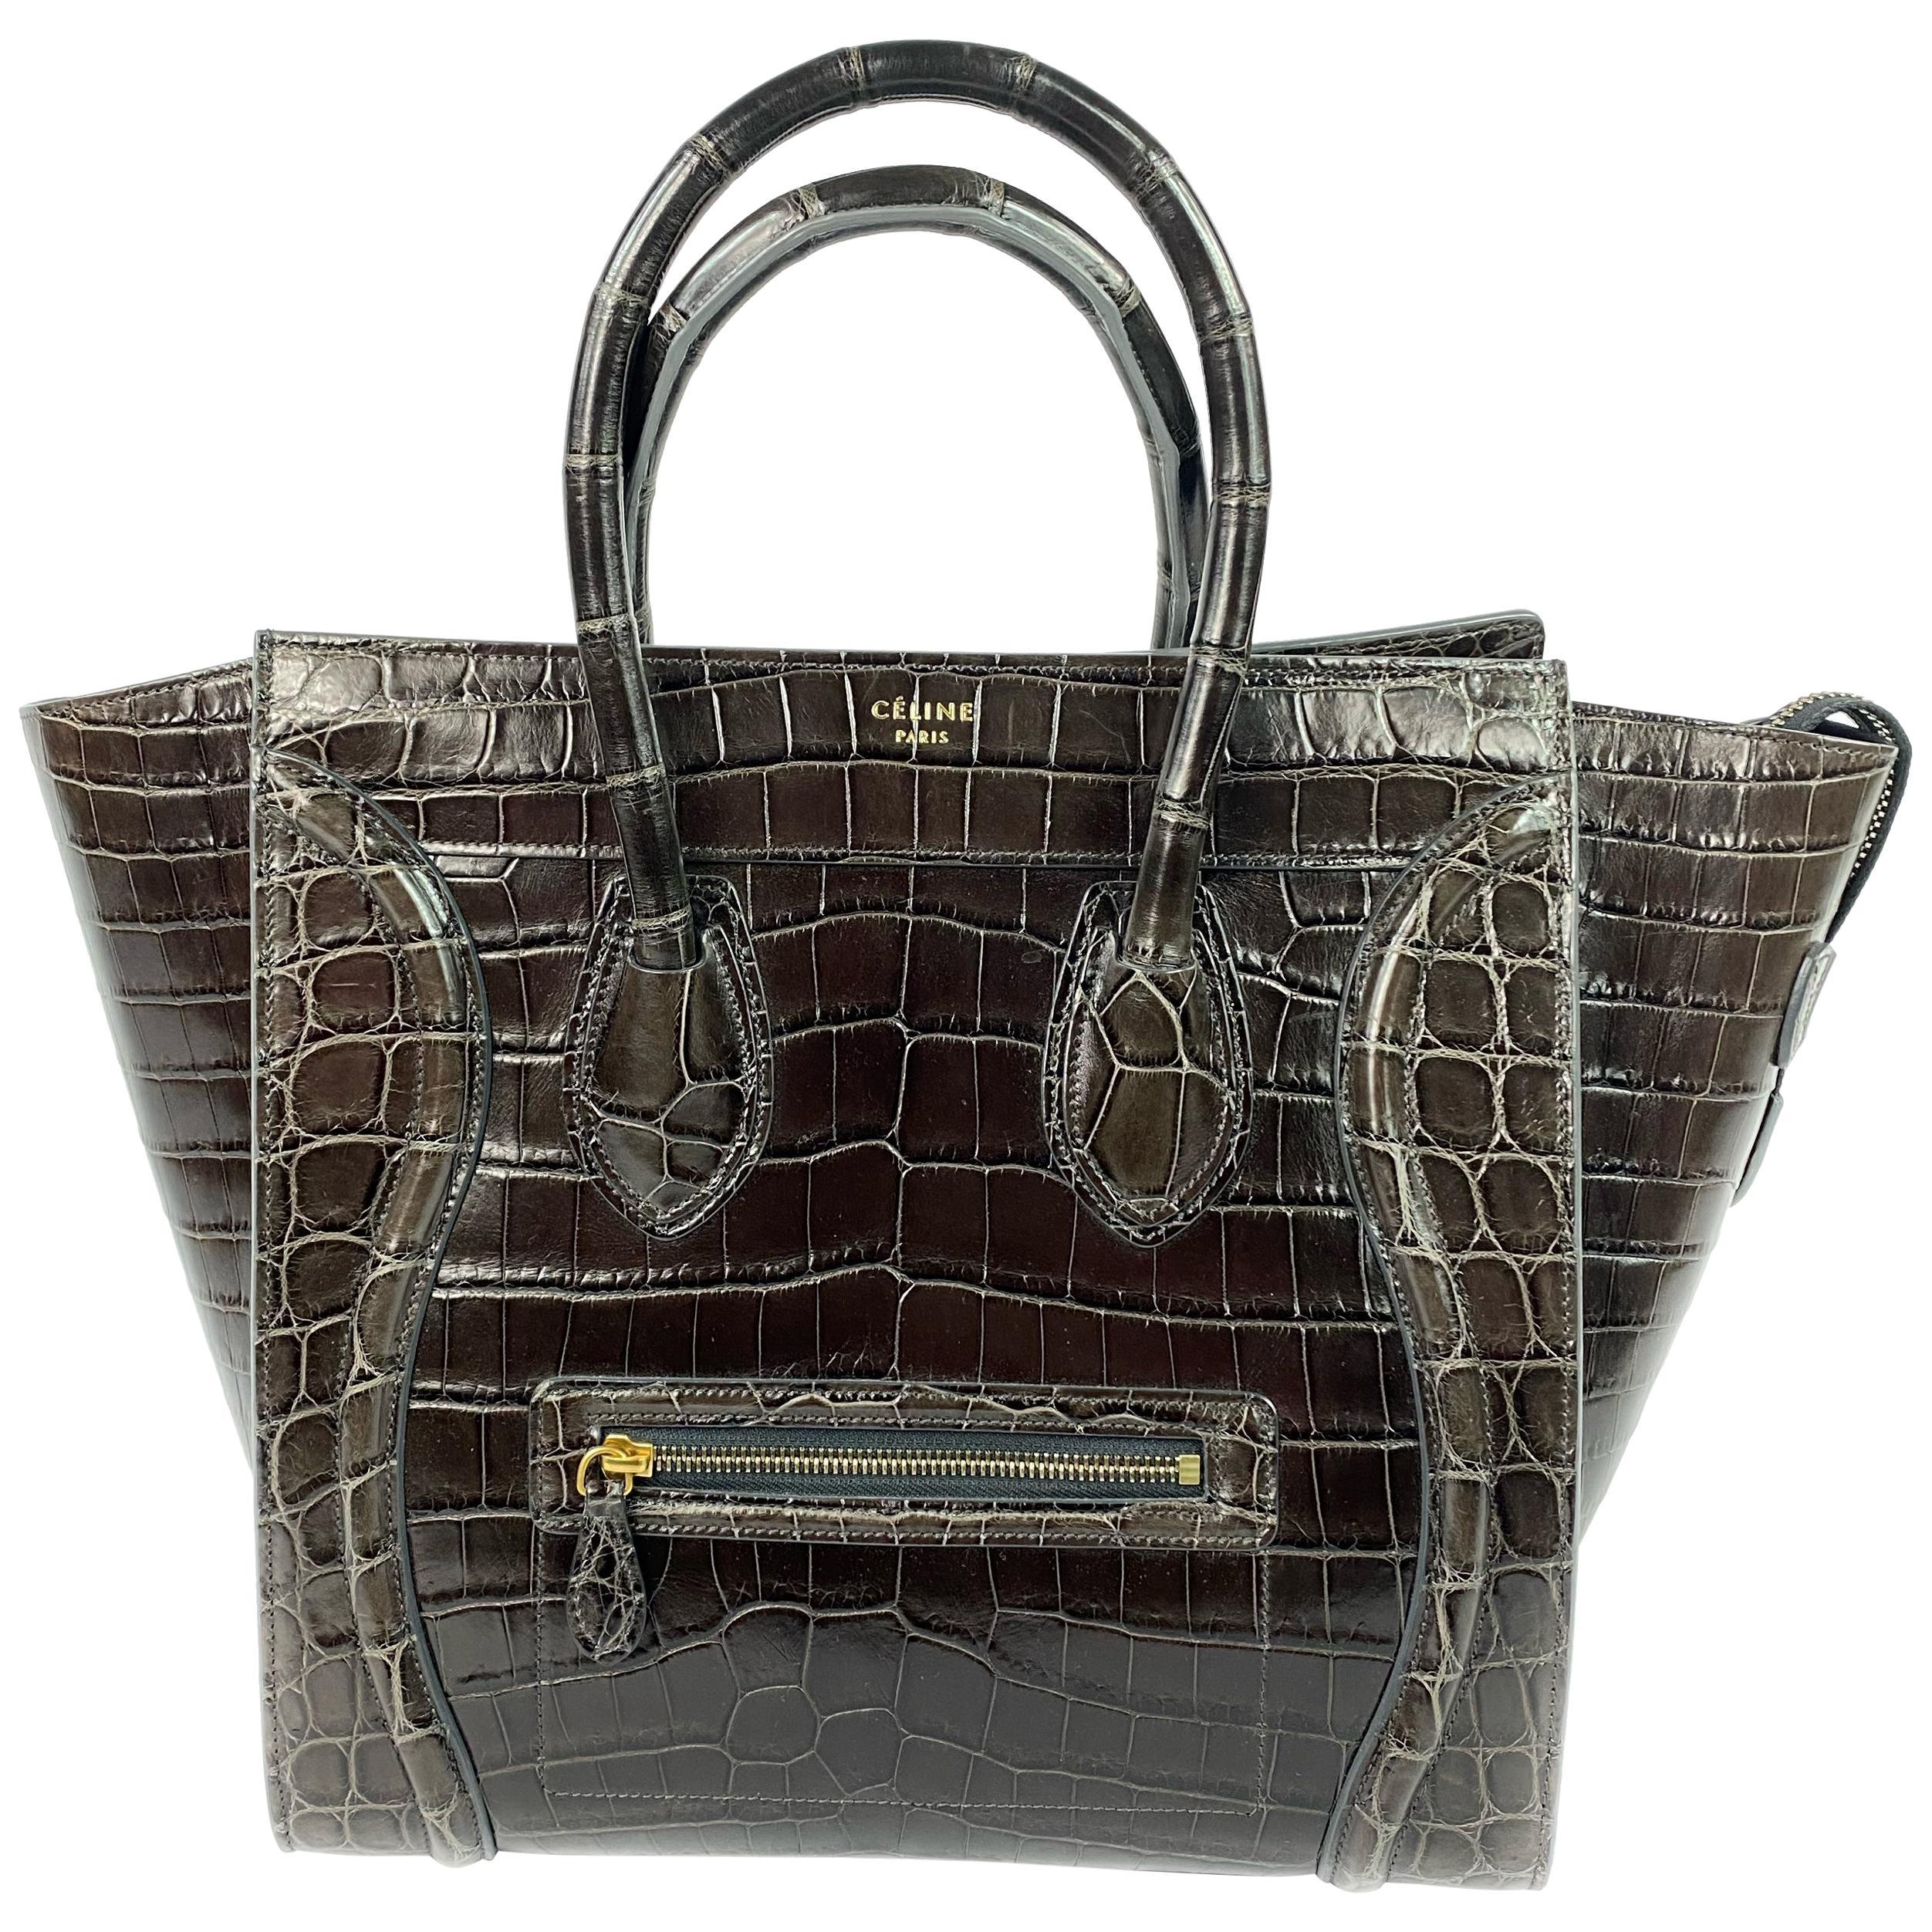 CELINE Brown Crocodile Medium Phantom Luggage Tote Bag